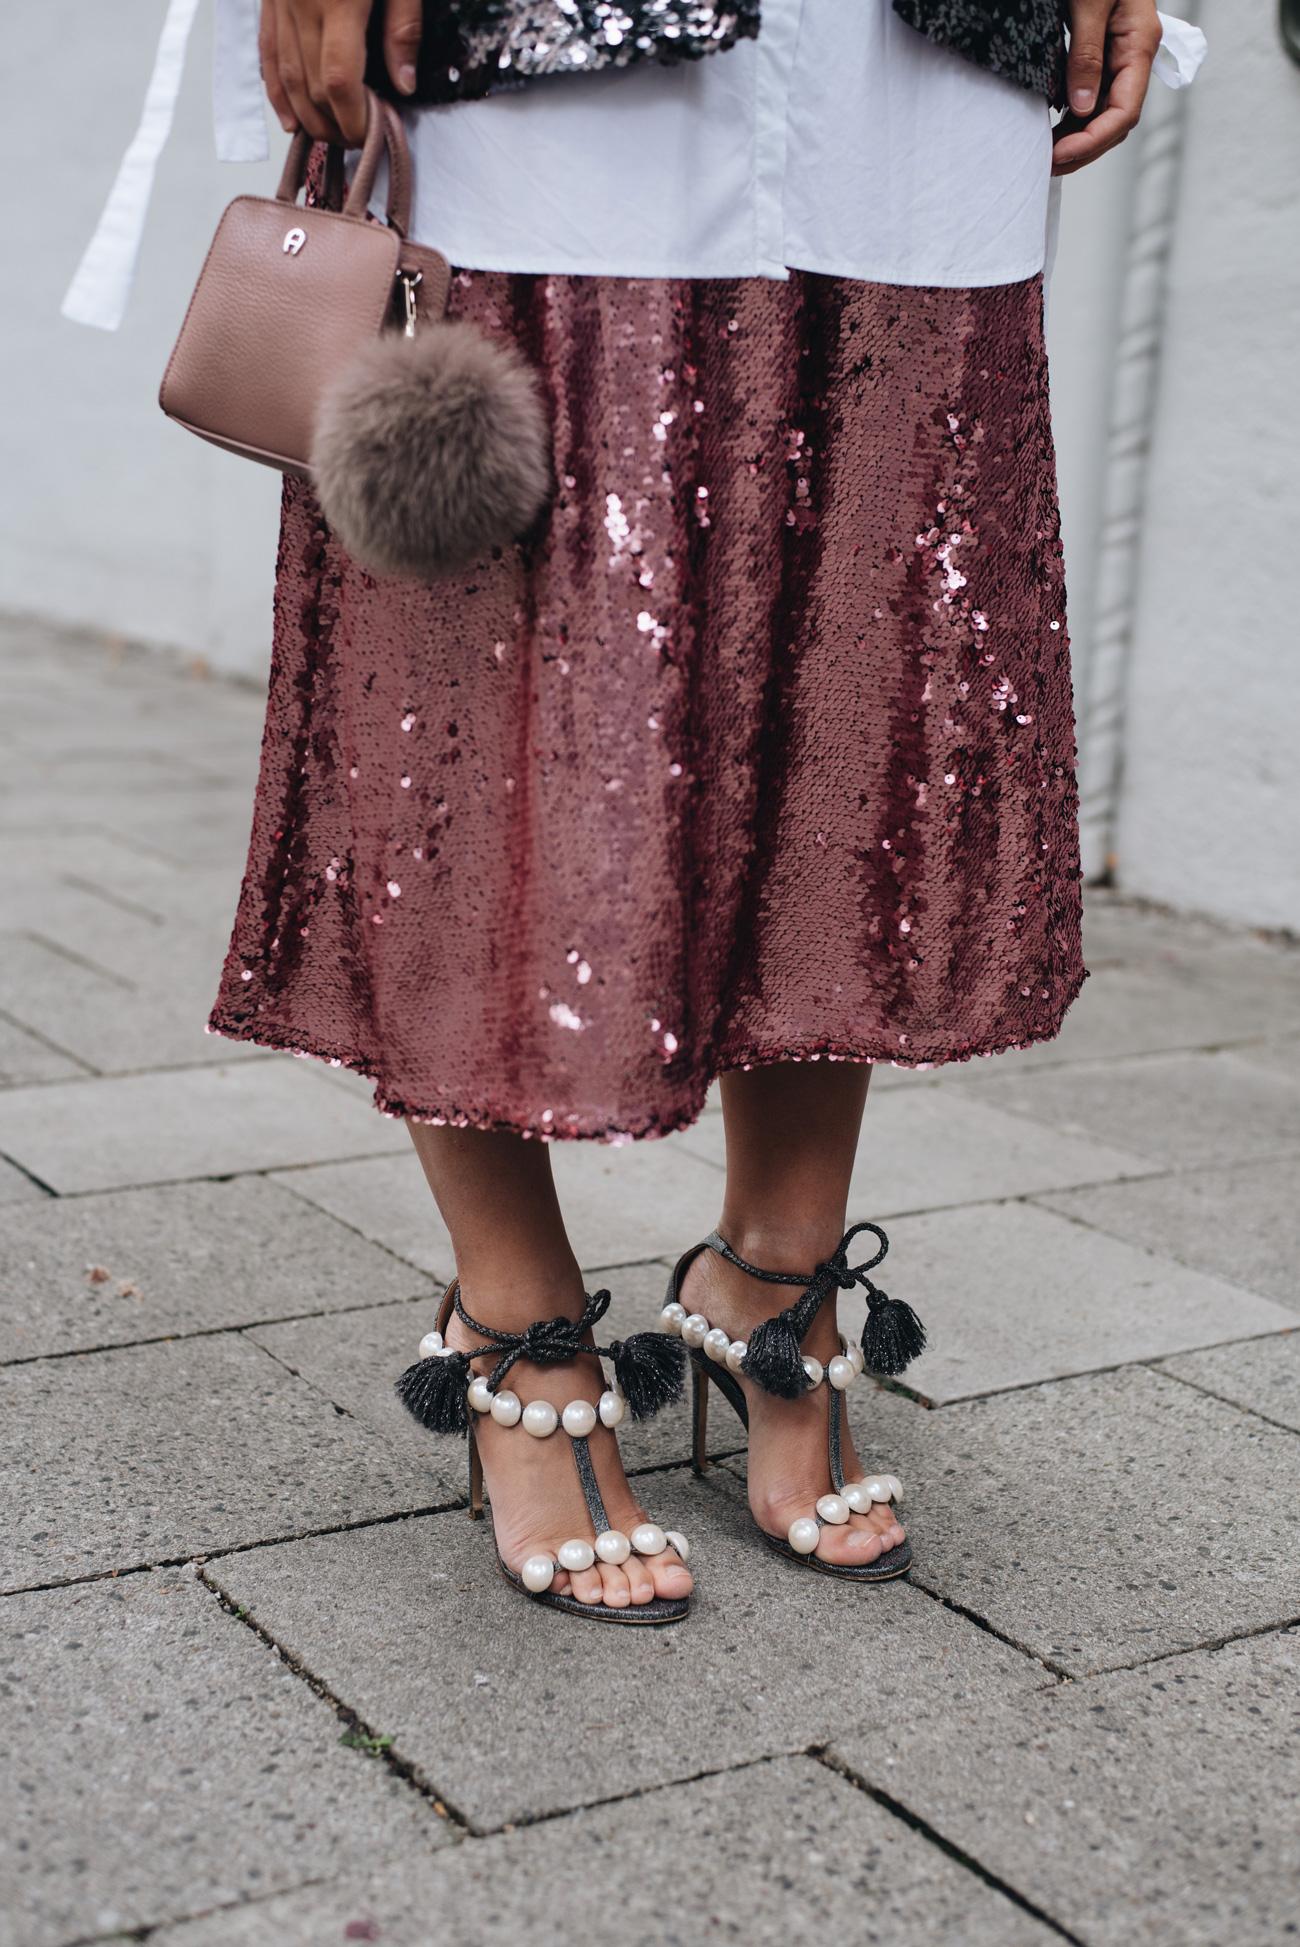 pailletten-rock-pink-H&M-midi-länge-sandalen-mit-perlen-mini-bag-Pearl-sandals--Diana-Paula-Cademartori-nina-schwichtenberg-fashiioncarpet